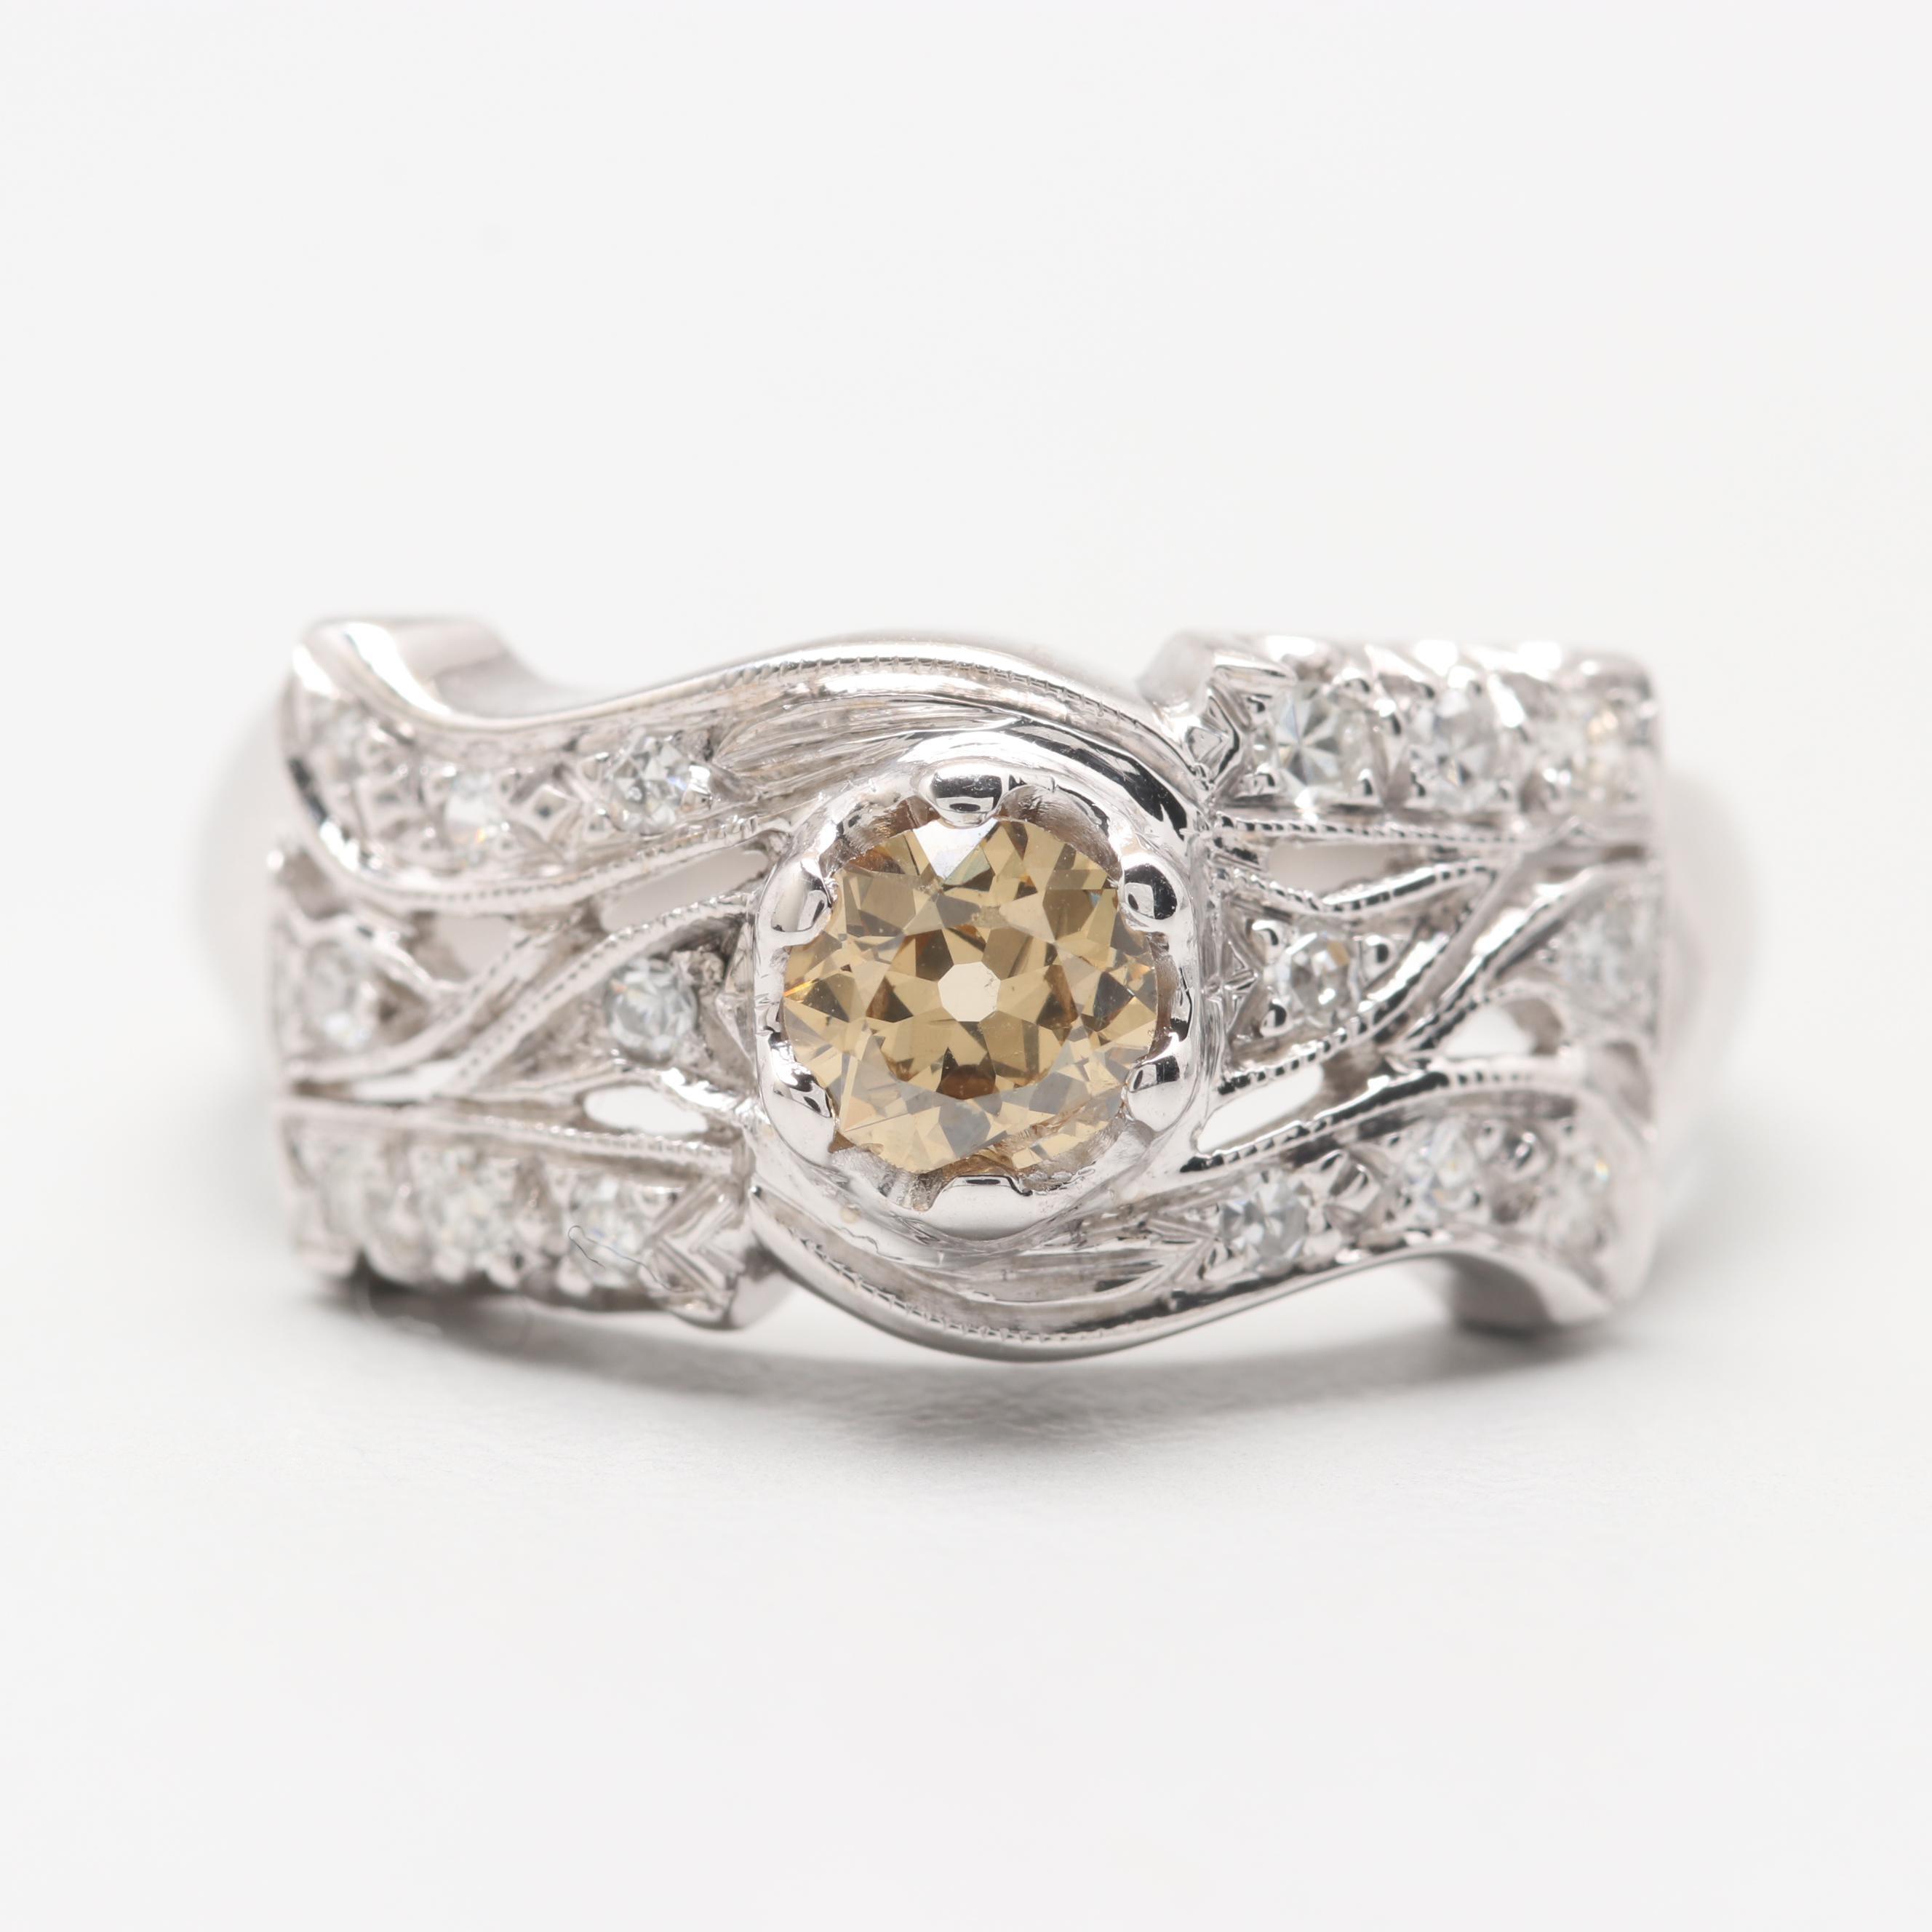 14K Yellow Gold Fancy Color Old European Cut Diamond Ring